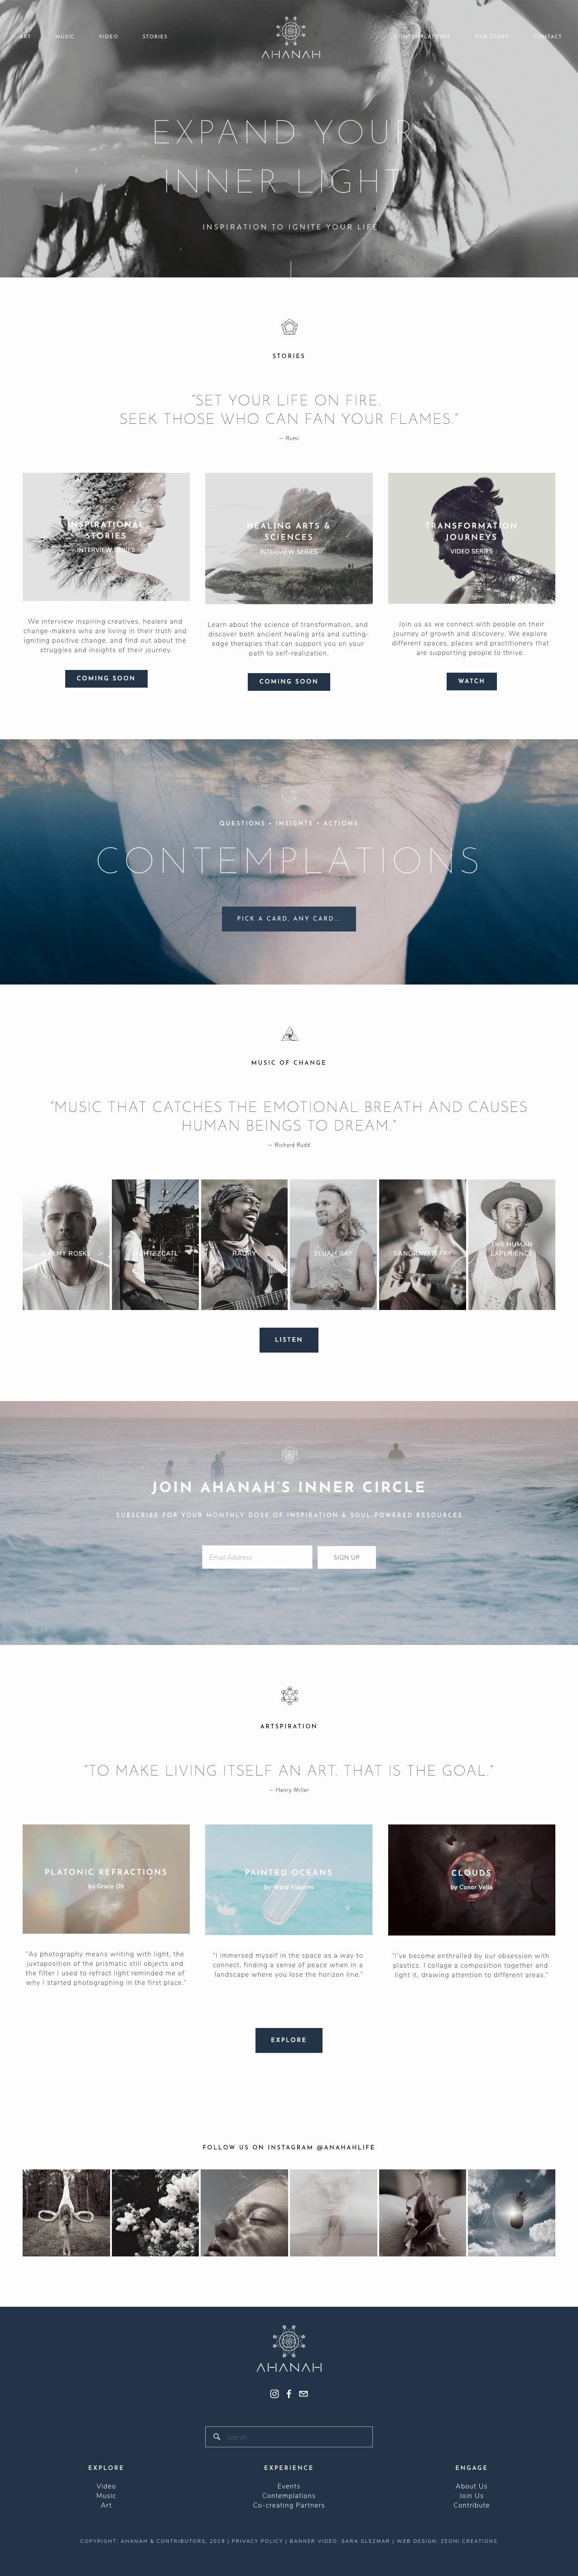 AHANAH+BALI+WEB+DESIGN+ZEONI+CREATIONS.jpg